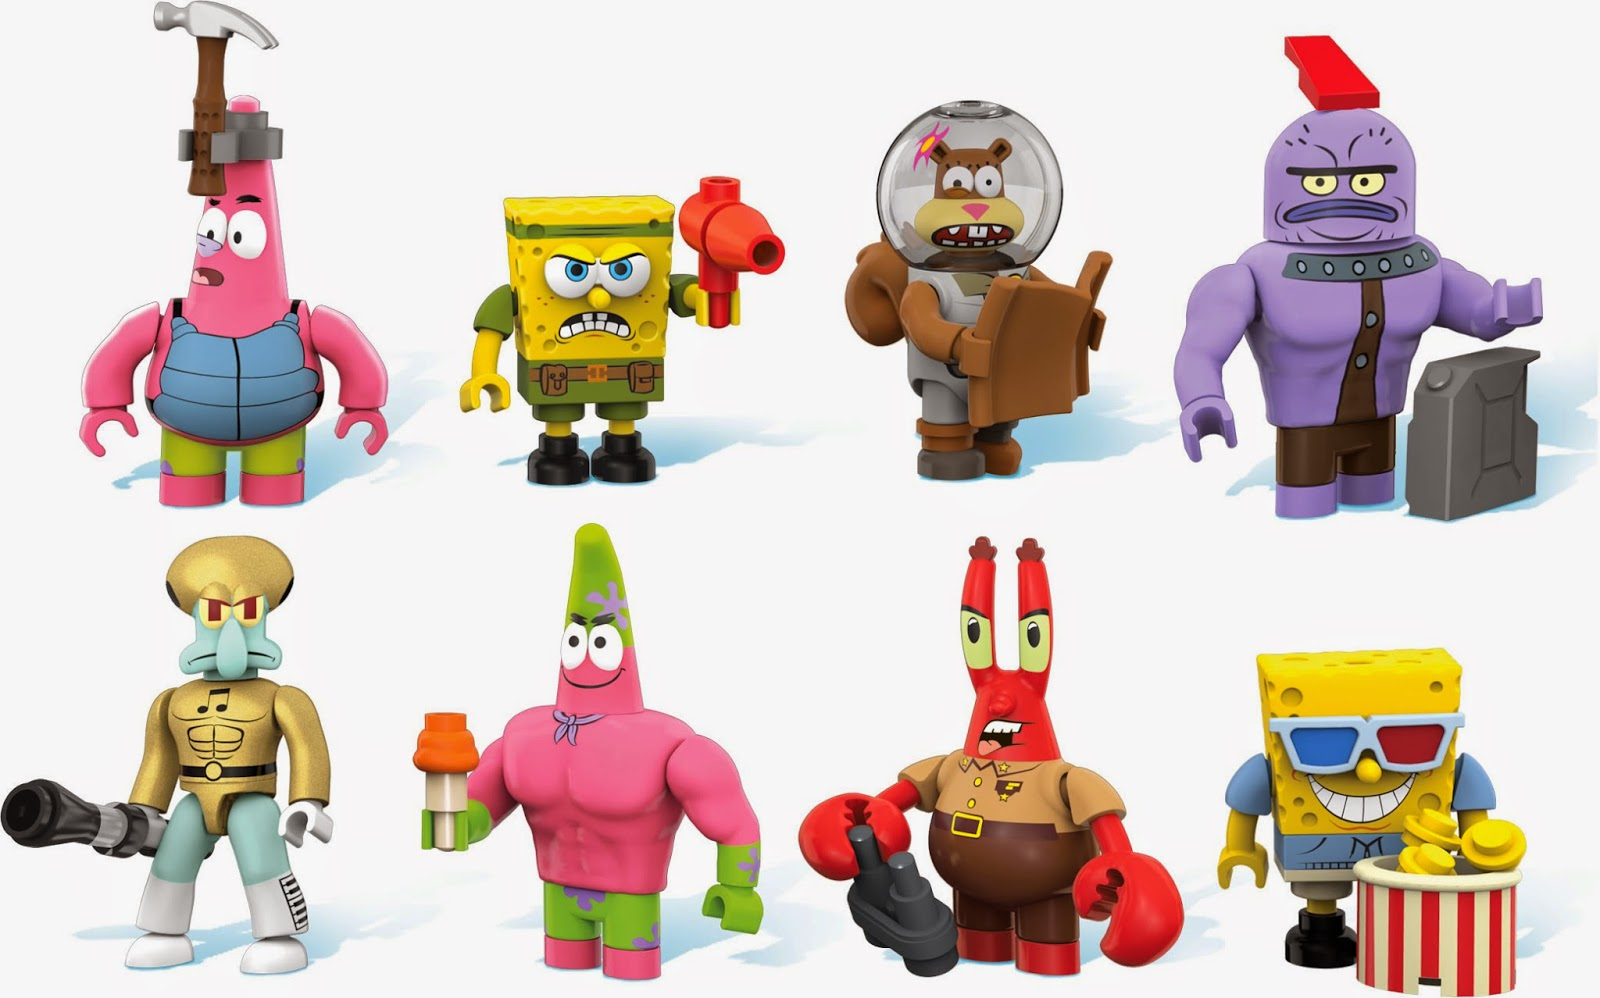 Spongebob Squarepants Mega Bloks Series 1 Surfer Dude Common